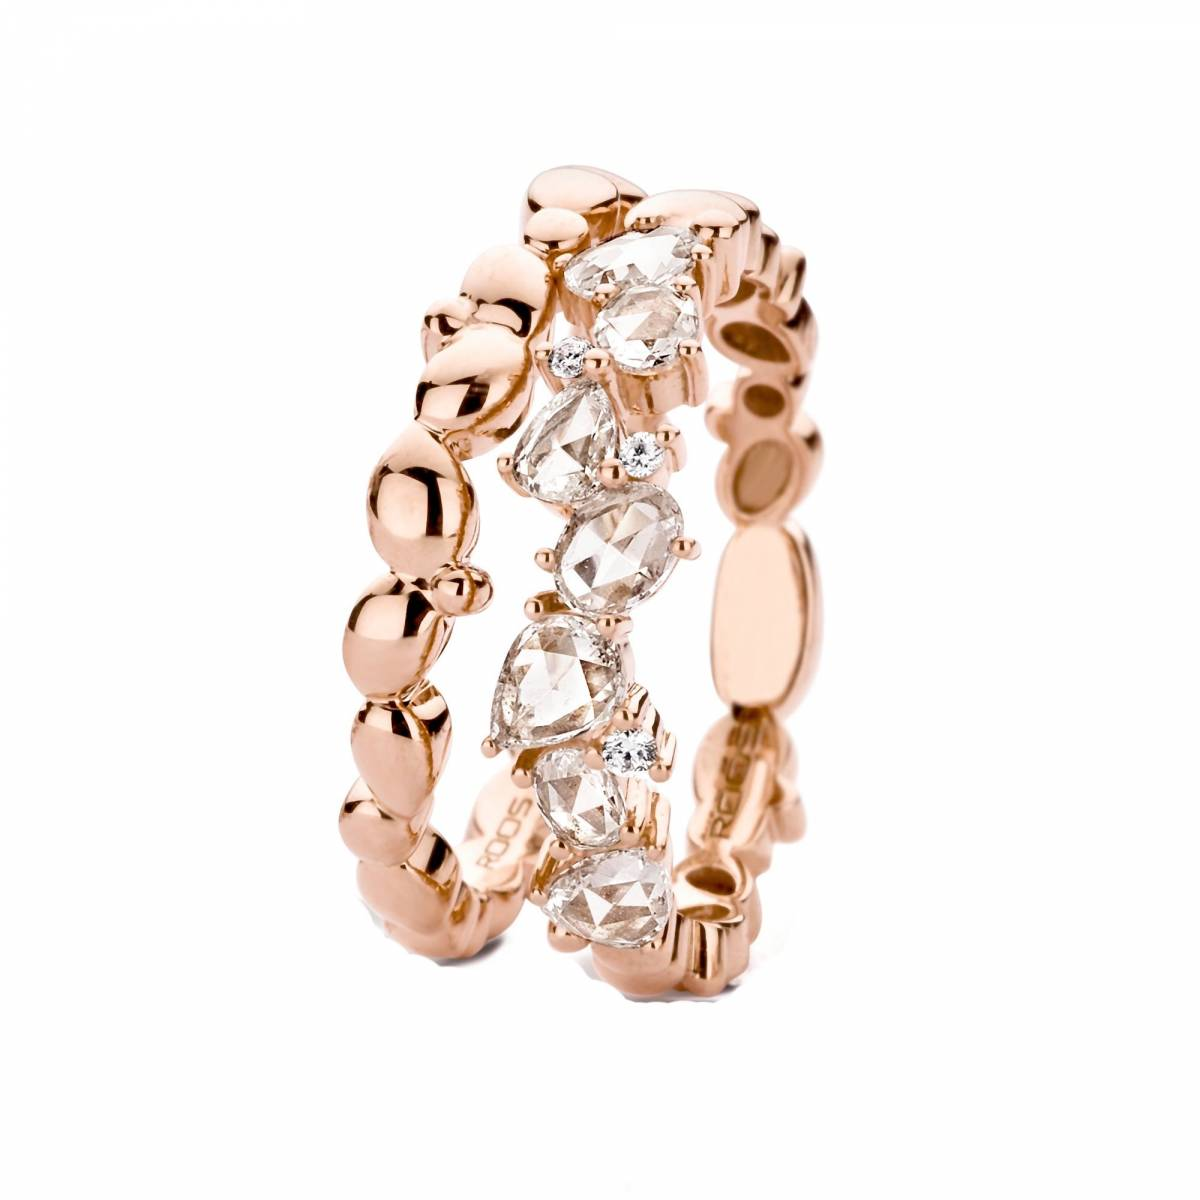 Juwelier Vandromme - Bruidsjuwelen - Juwelen - trouwring - verlovingsring - House of Weddings - Foto 6 (1)